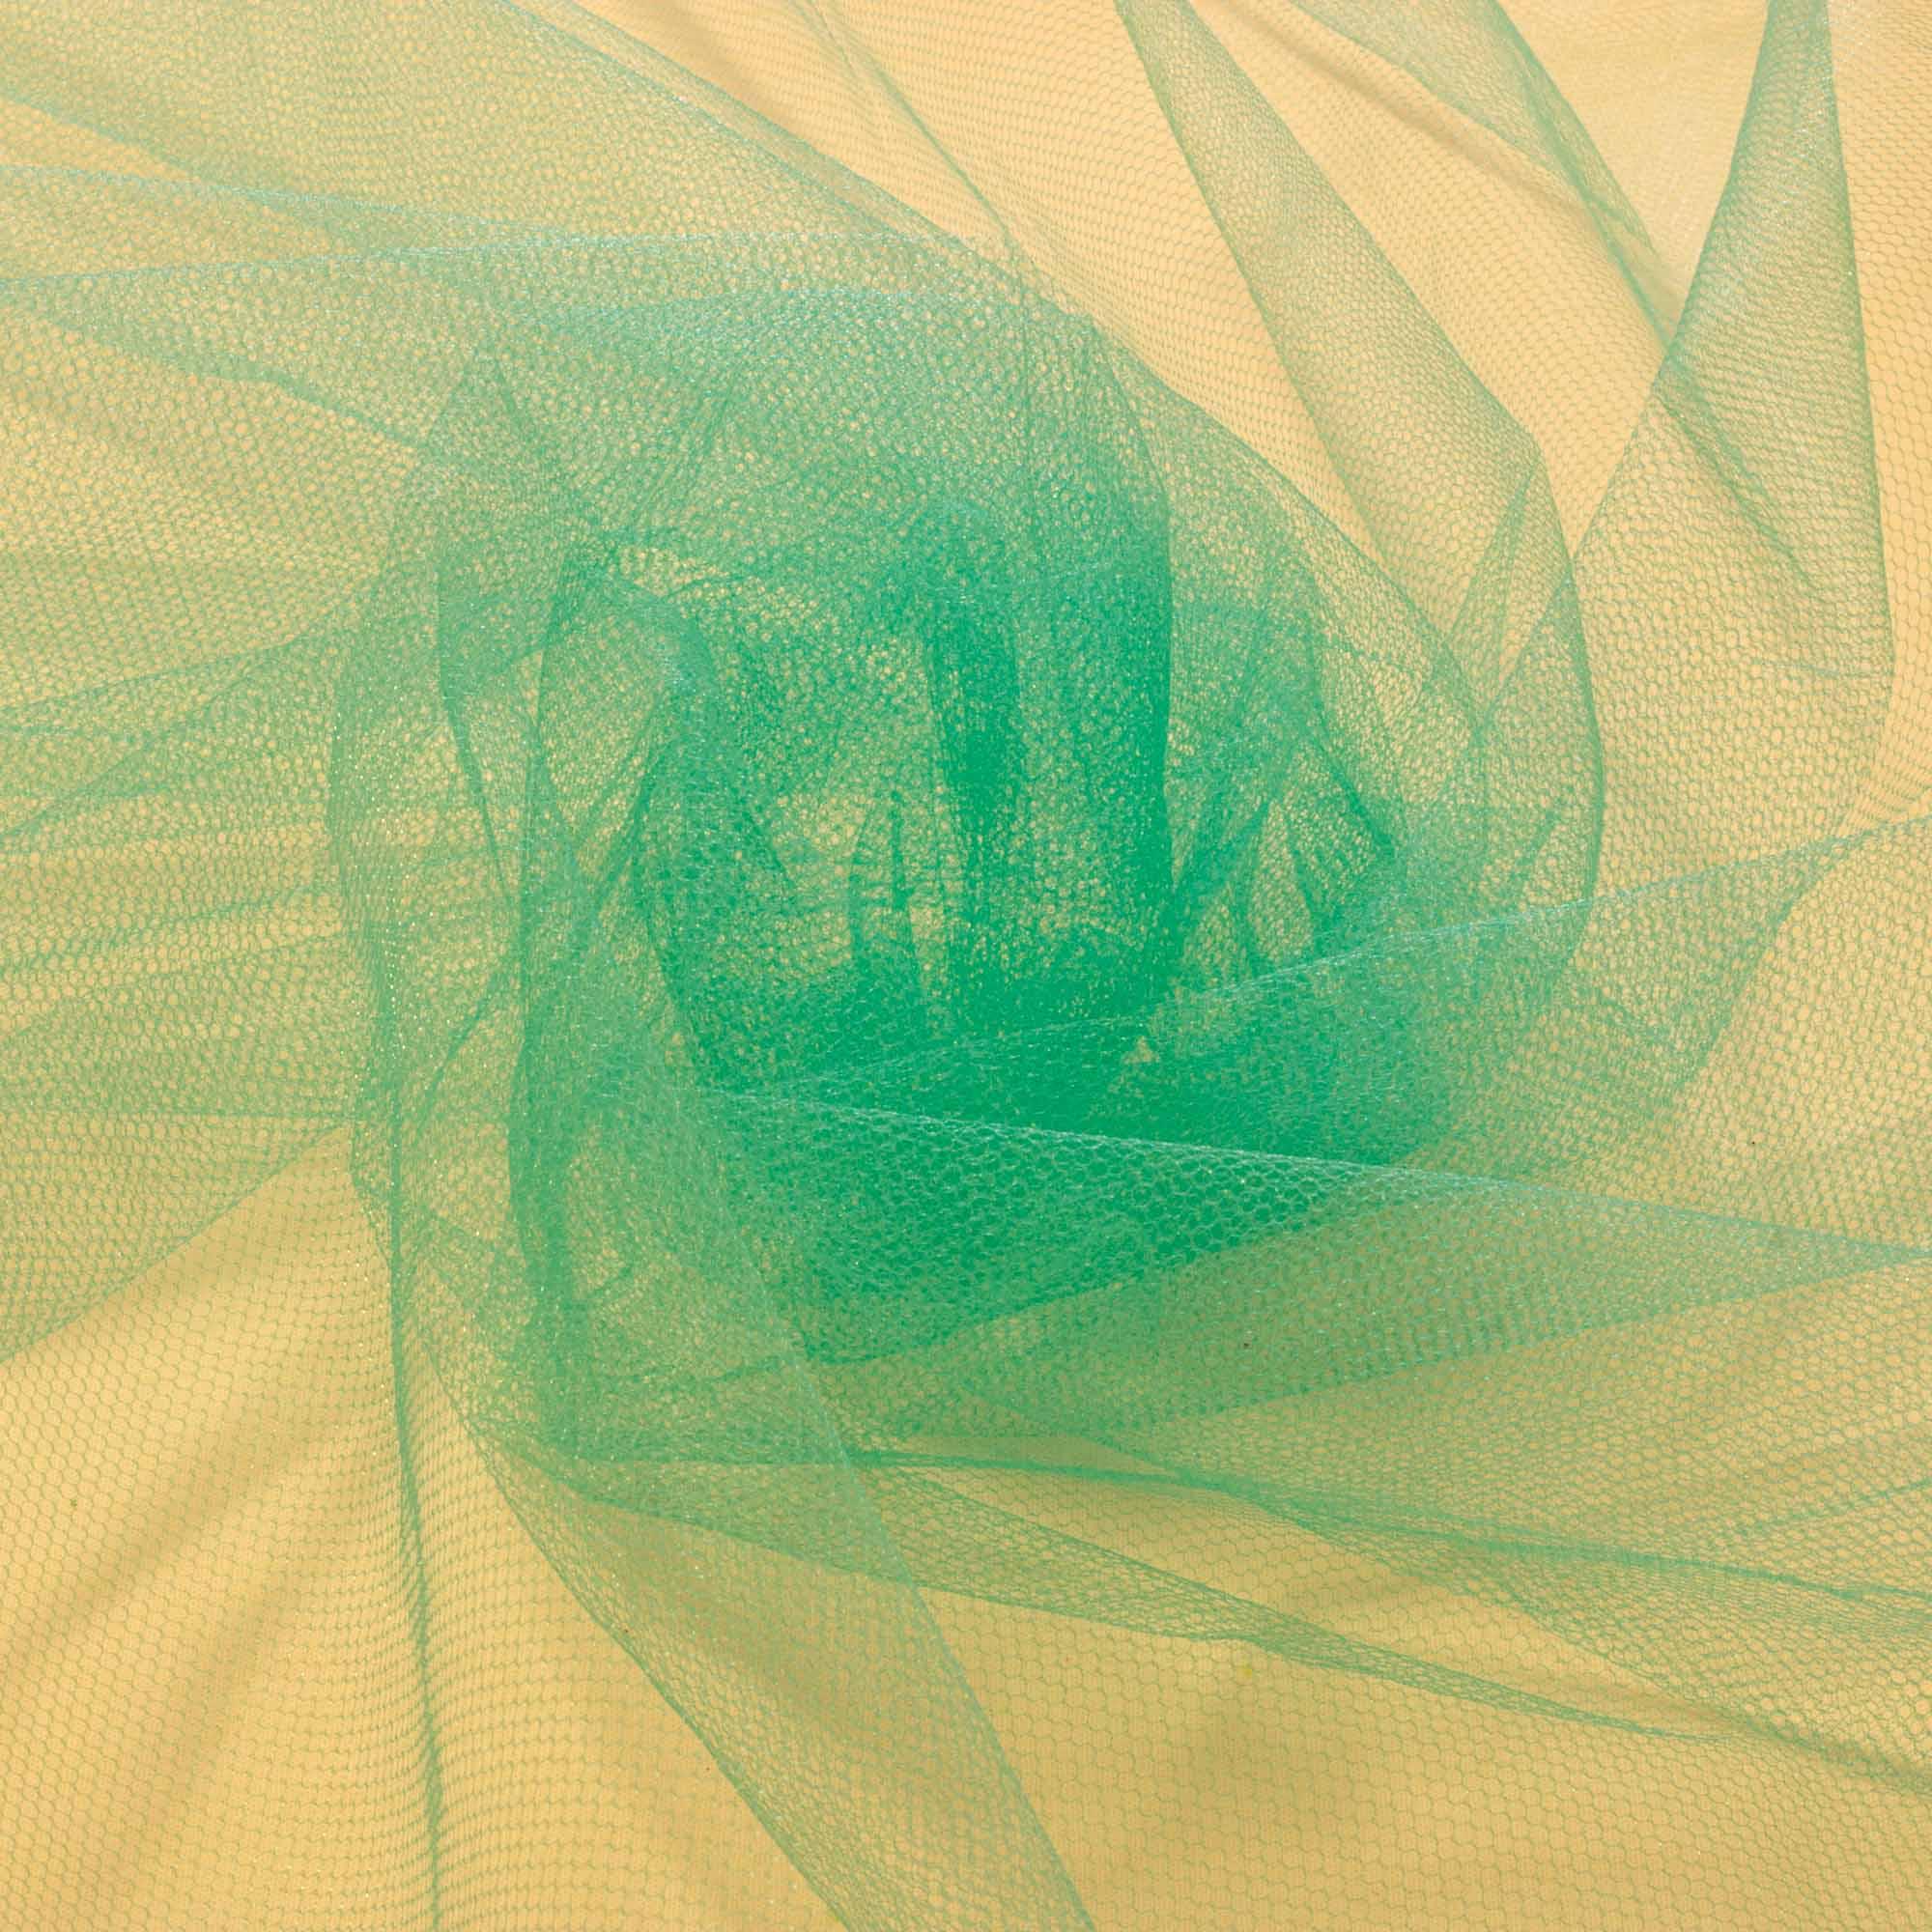 10 Metros Tecido Tule 1,20 Mt Largura Verde Tiffany